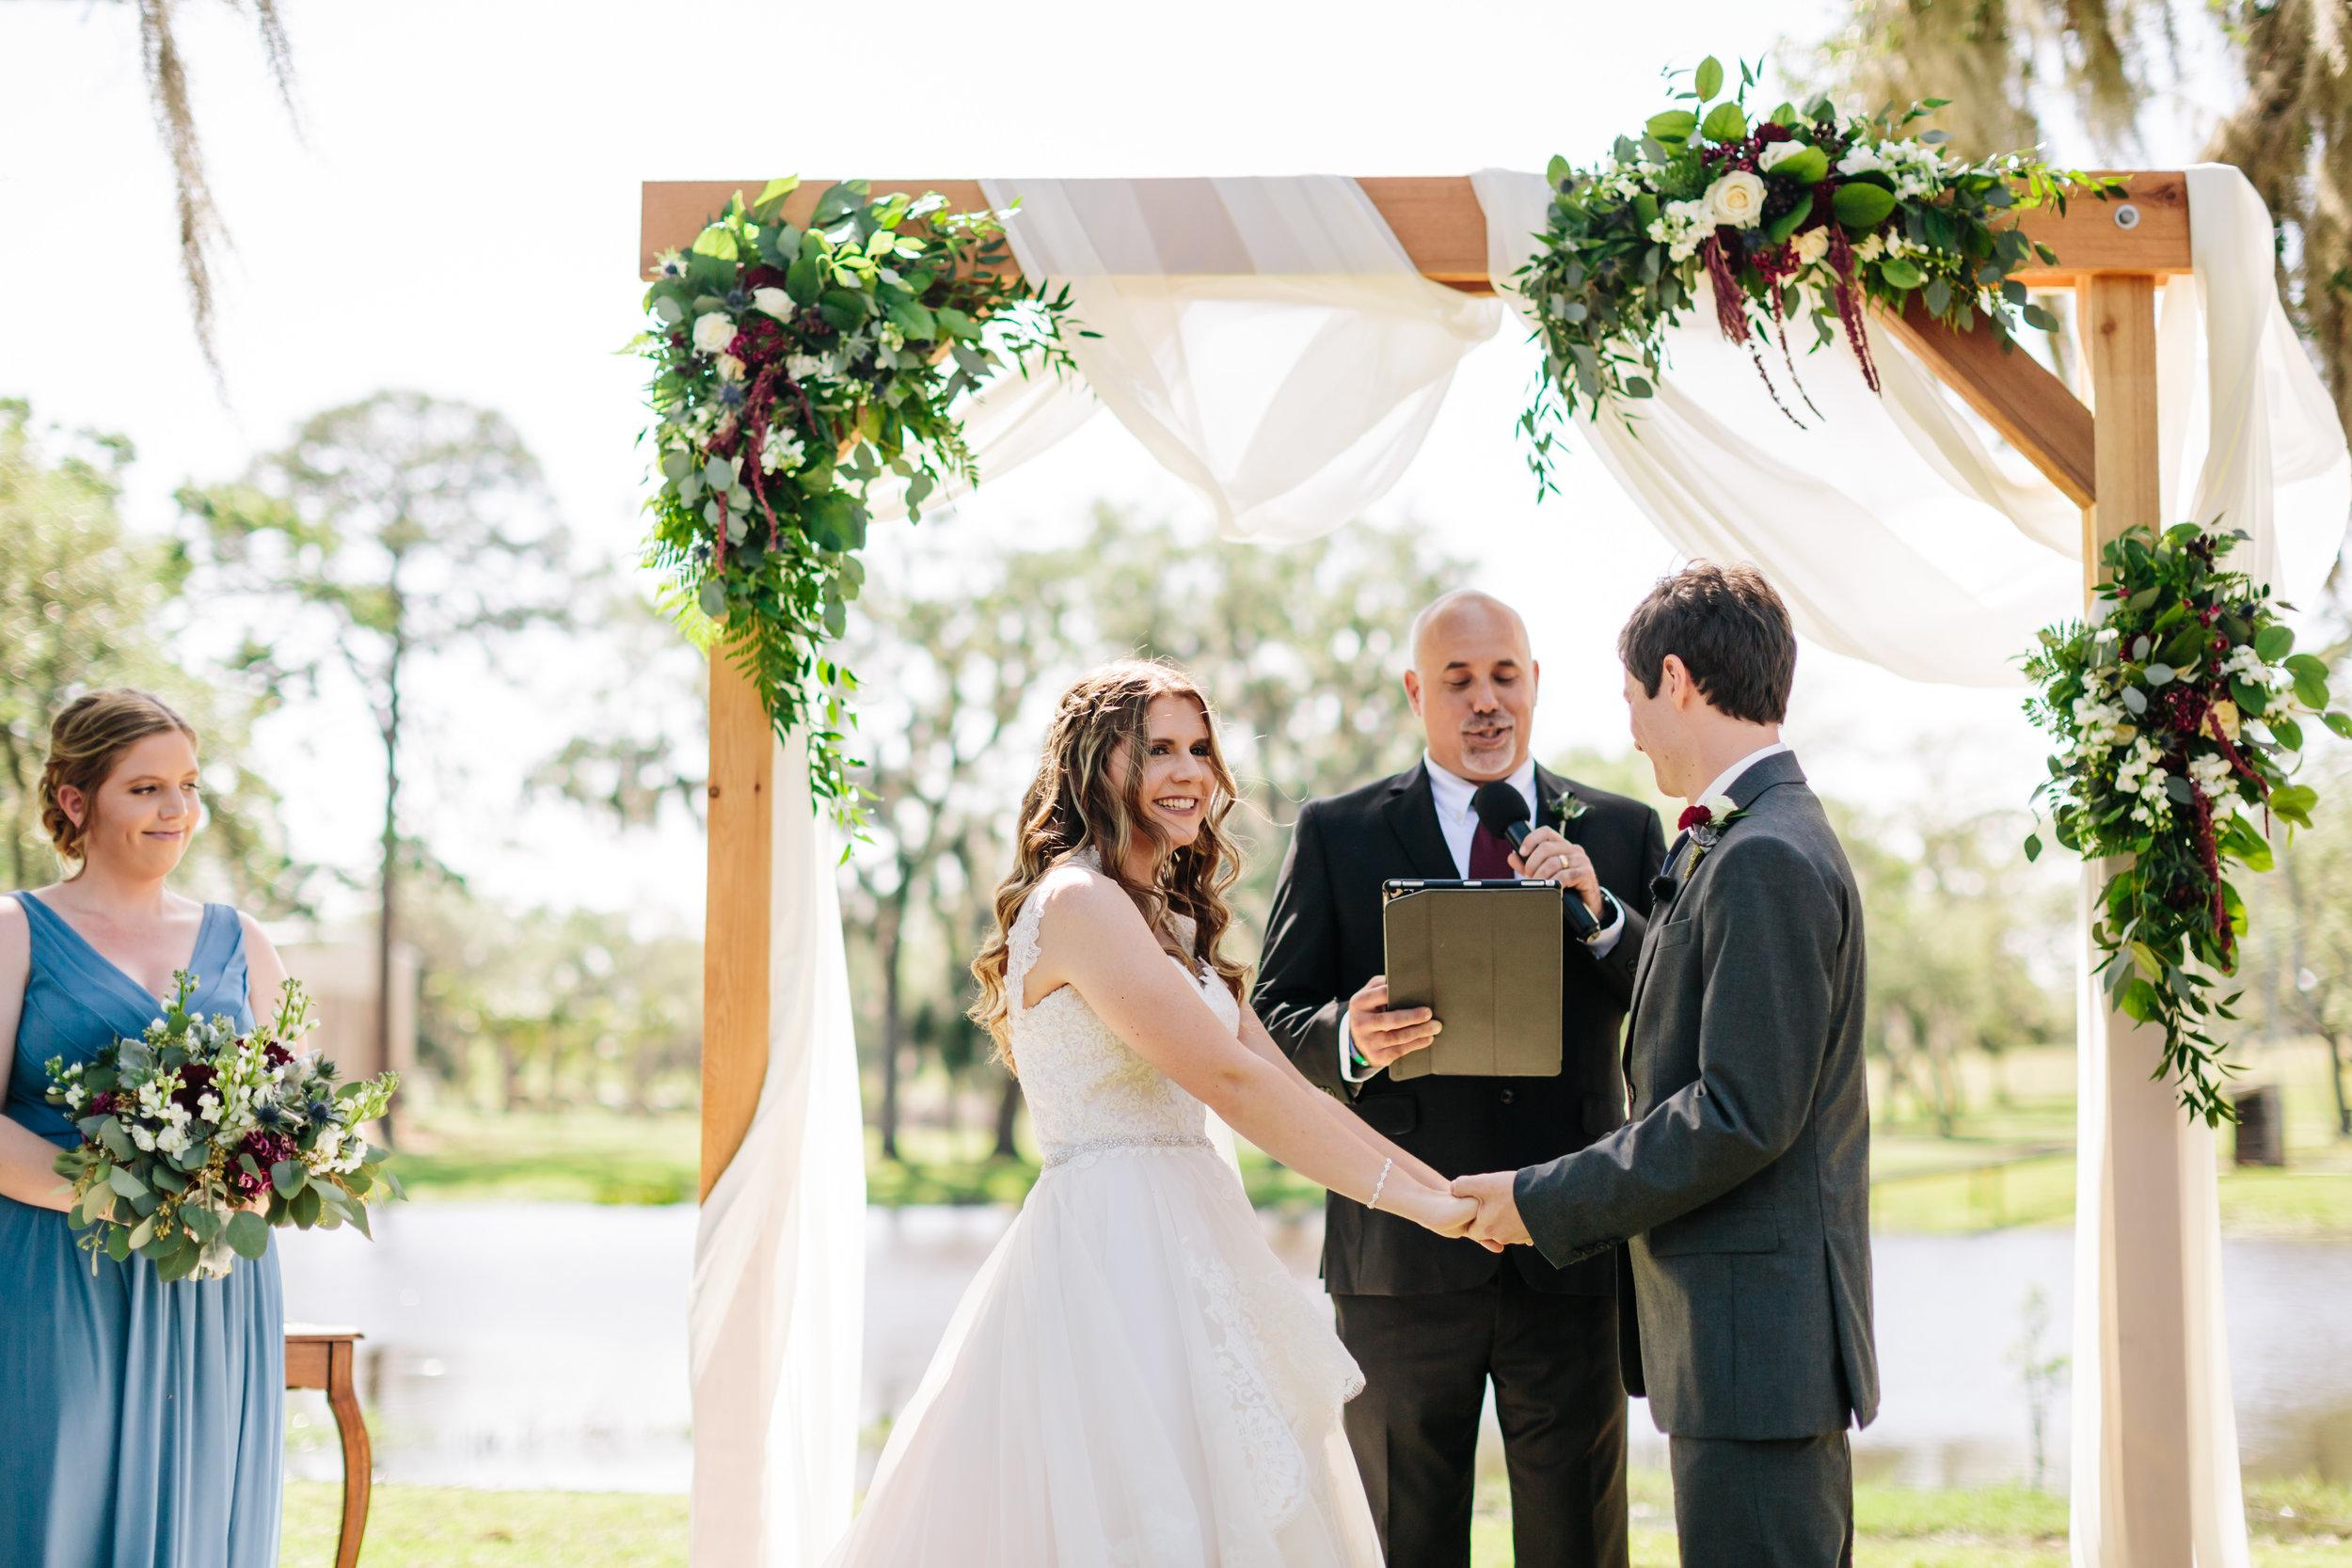 2018.04.14 Zak and Jamisyn Unrue Black Willow Barn Wedding Finals-348.jpg